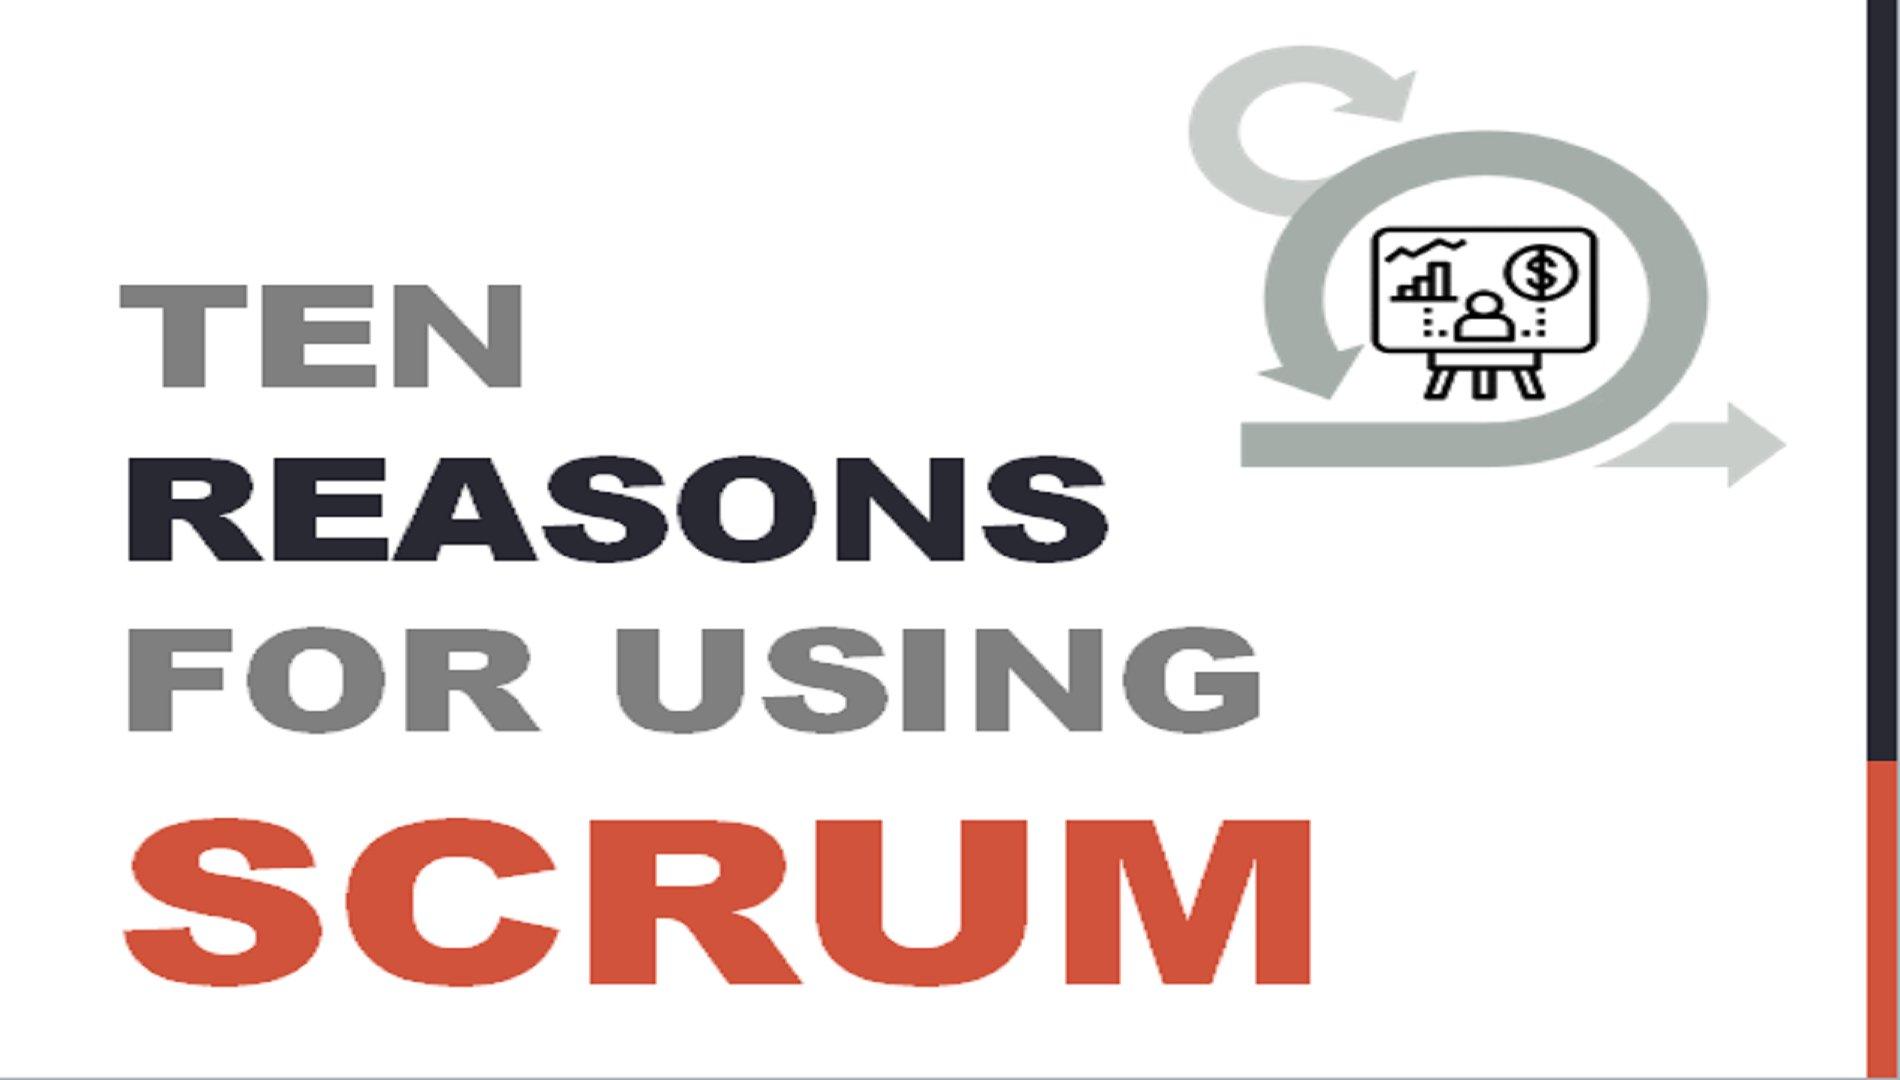 Ten Reasons for Using Scrum